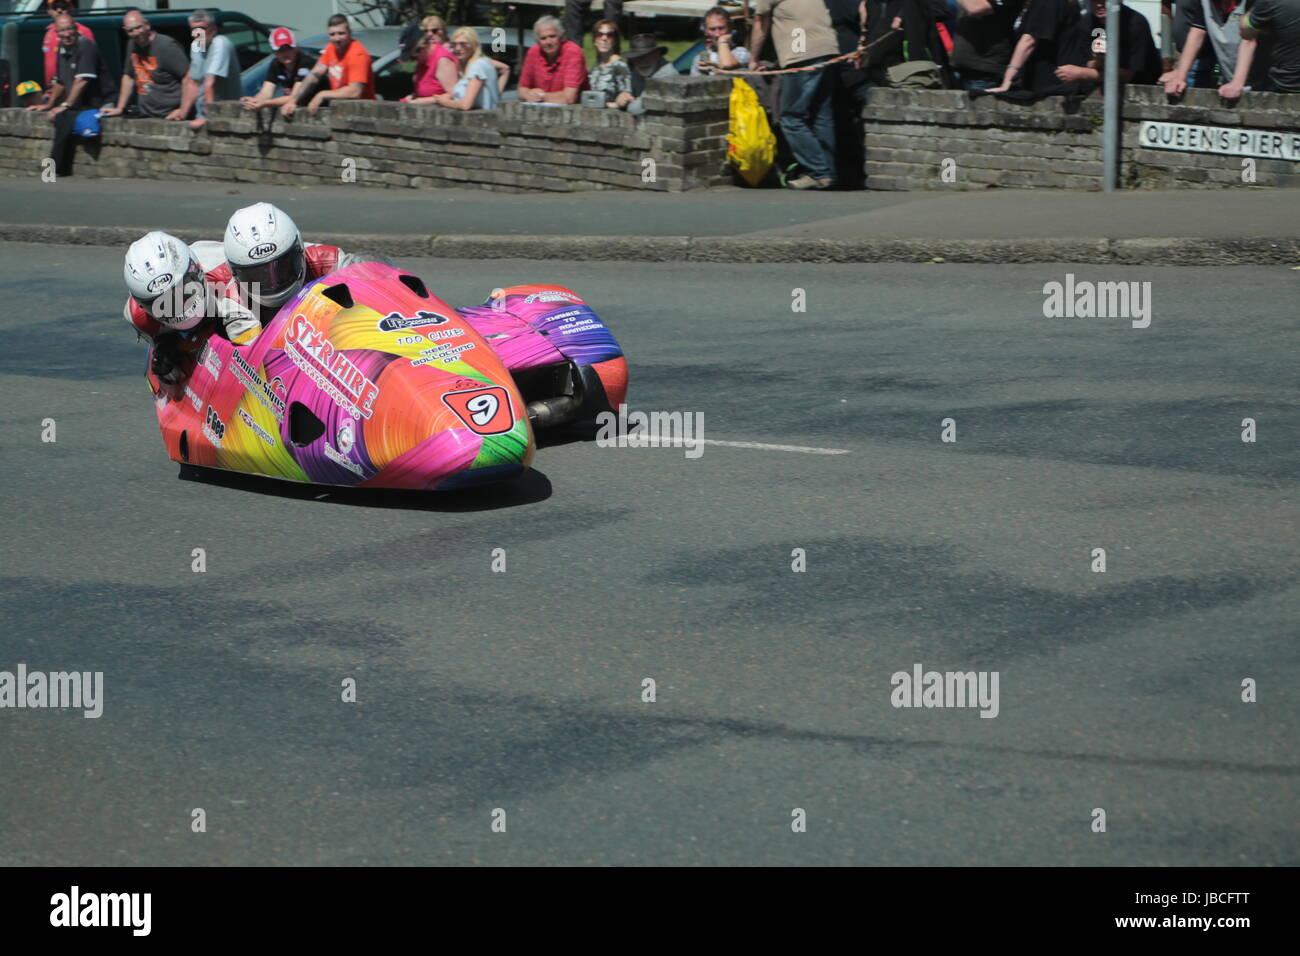 Isle Of Man, British Isles (UK). 9th June, 2017.  Fan Favorites, number 9 Steve Ramsden and Matty Ramsden (LCR / Stock Photo